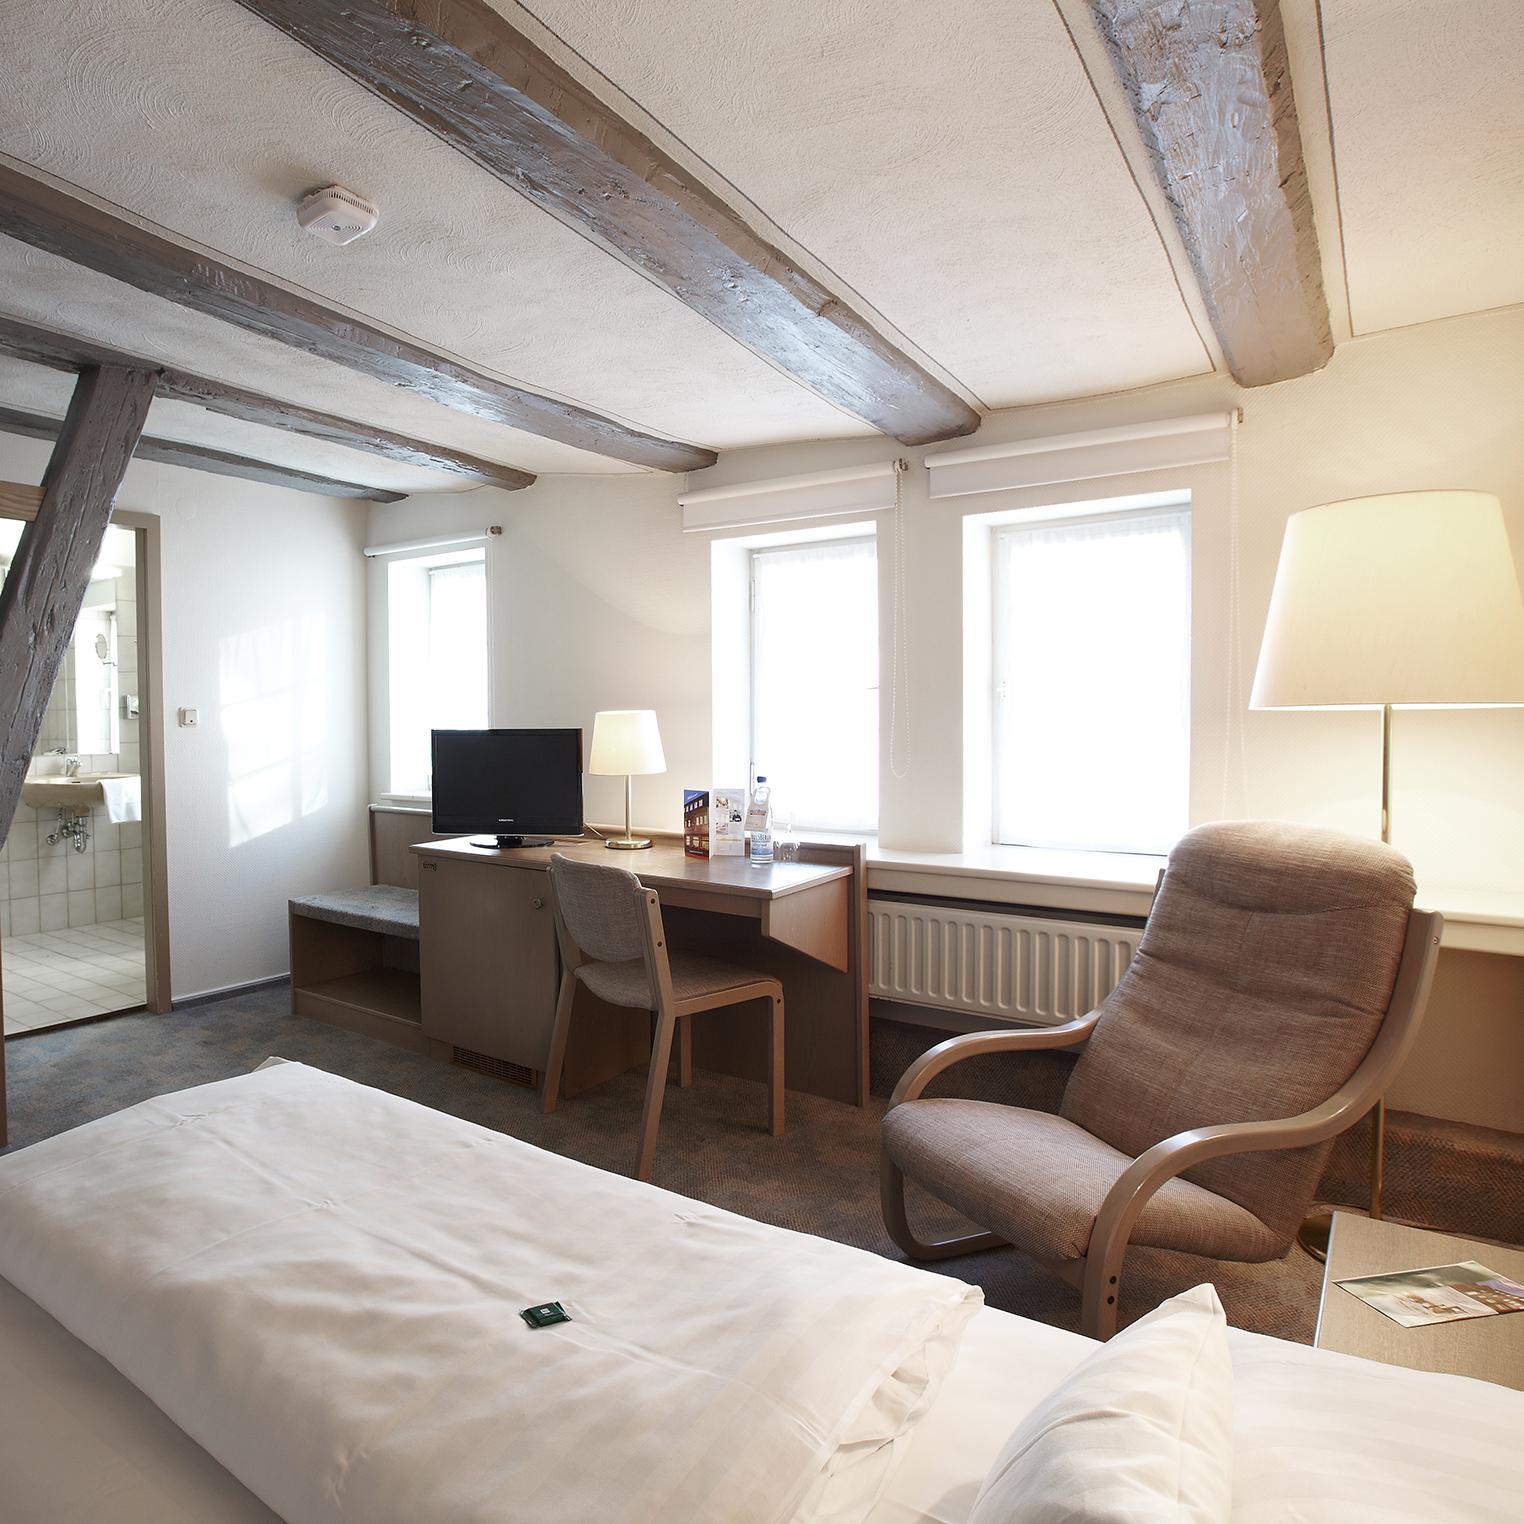 Hotel-Klingelhöffer-050115 17140_web